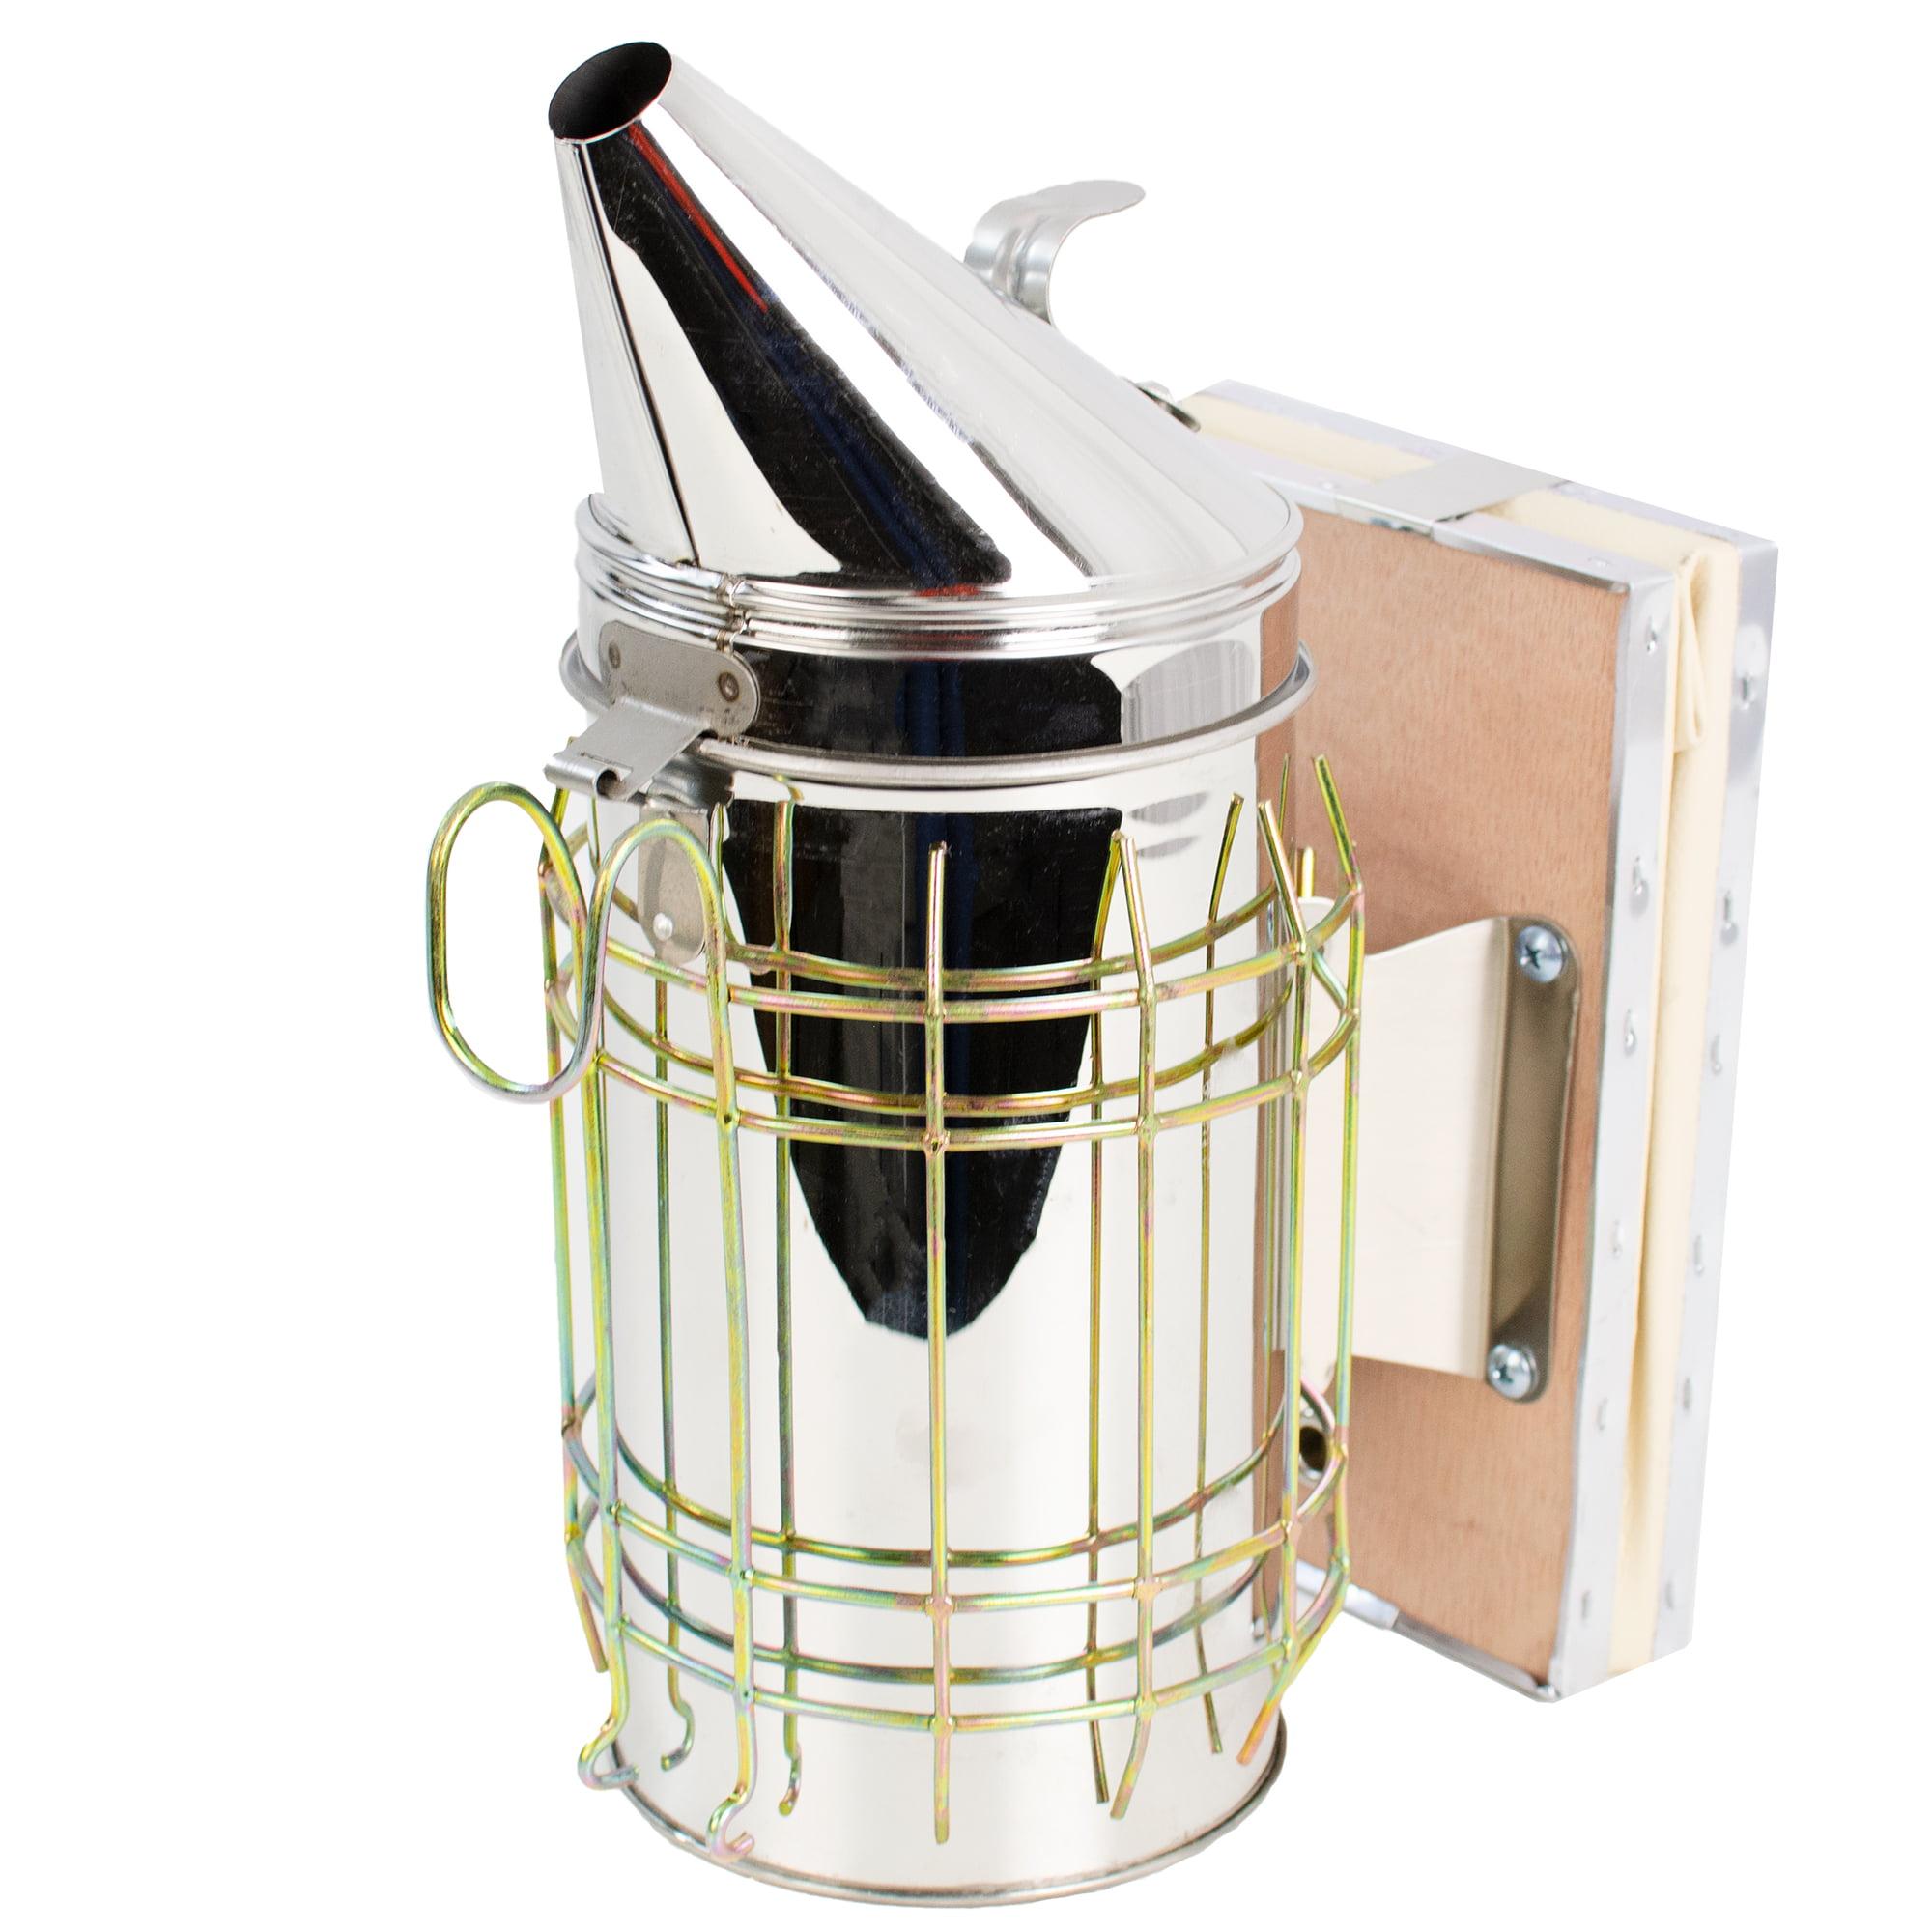 VIVO Large Bee Hive Smoker Stainless Steel w/Heat Shield Beekeeping Equipment (BEE-V001L)